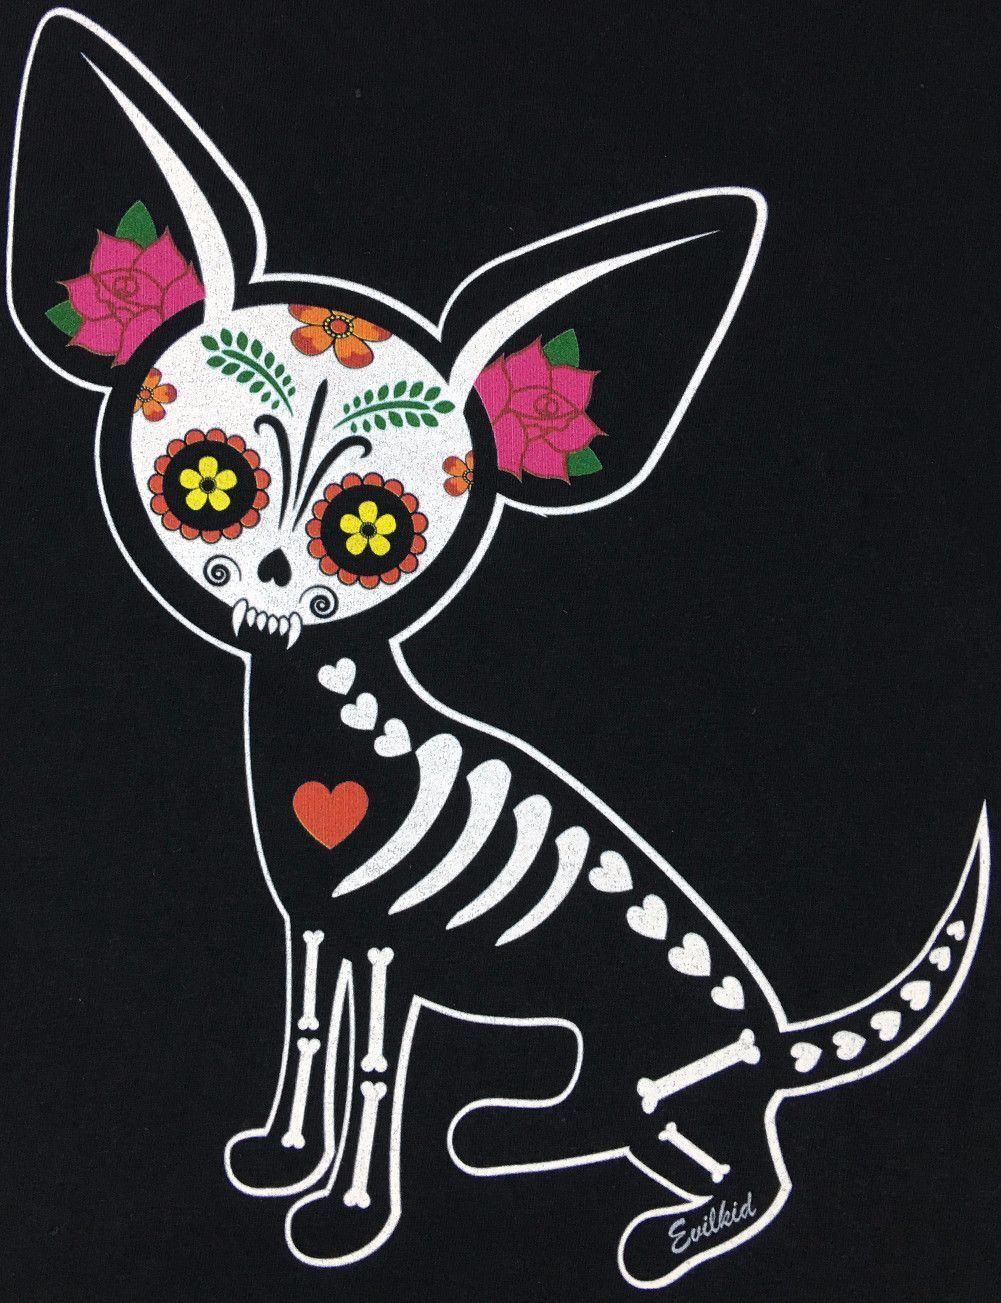 33906bcf Evilkid Chihuahua Muerta Sugar Skull Skeleton Dog Men's T-Shirt ...